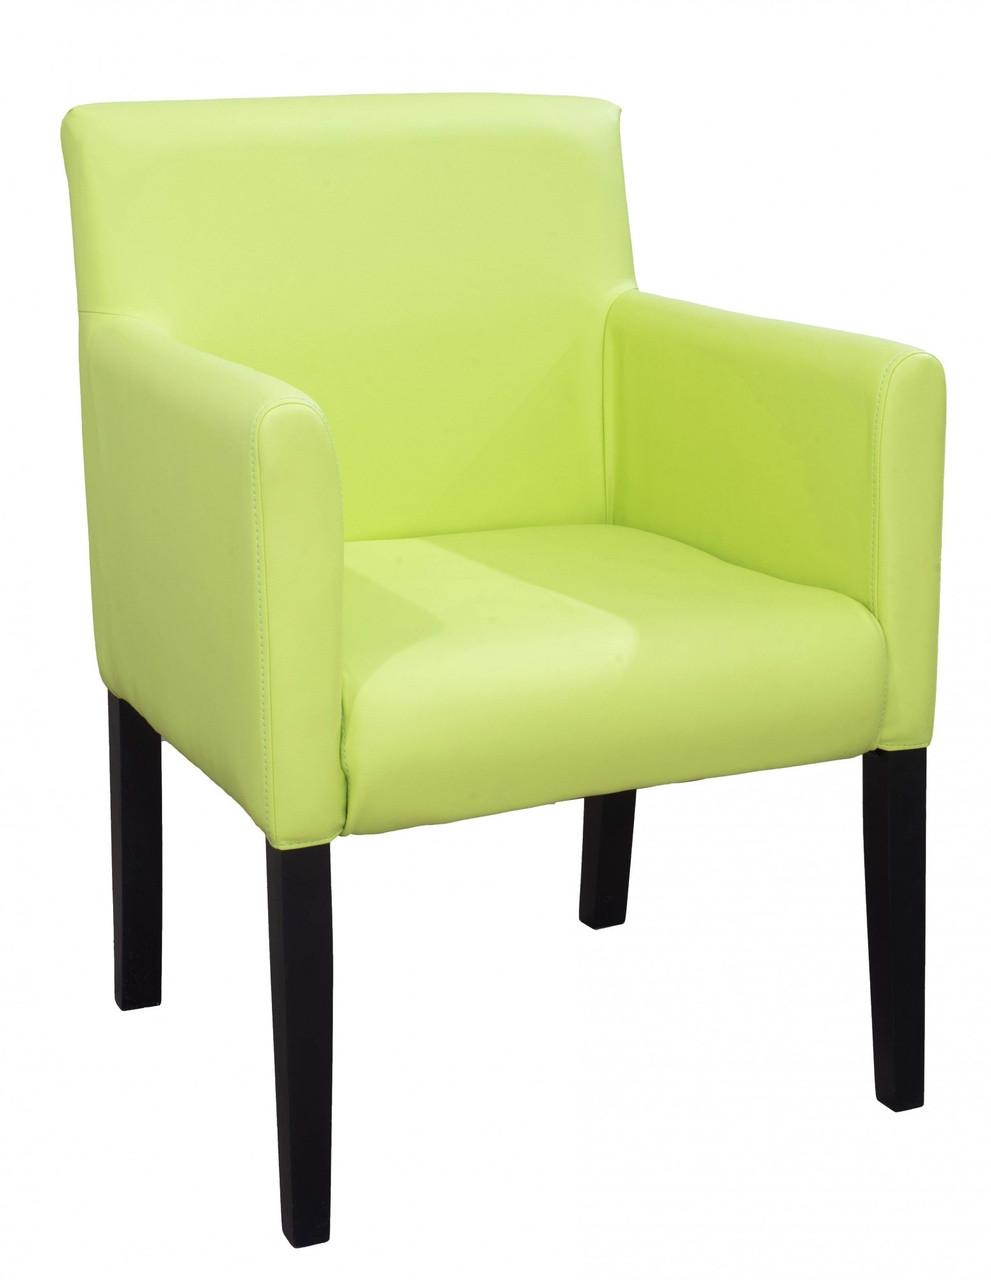 Кресло Richman Остин 61 x 60 x 88H Флай 2234 Салатовое